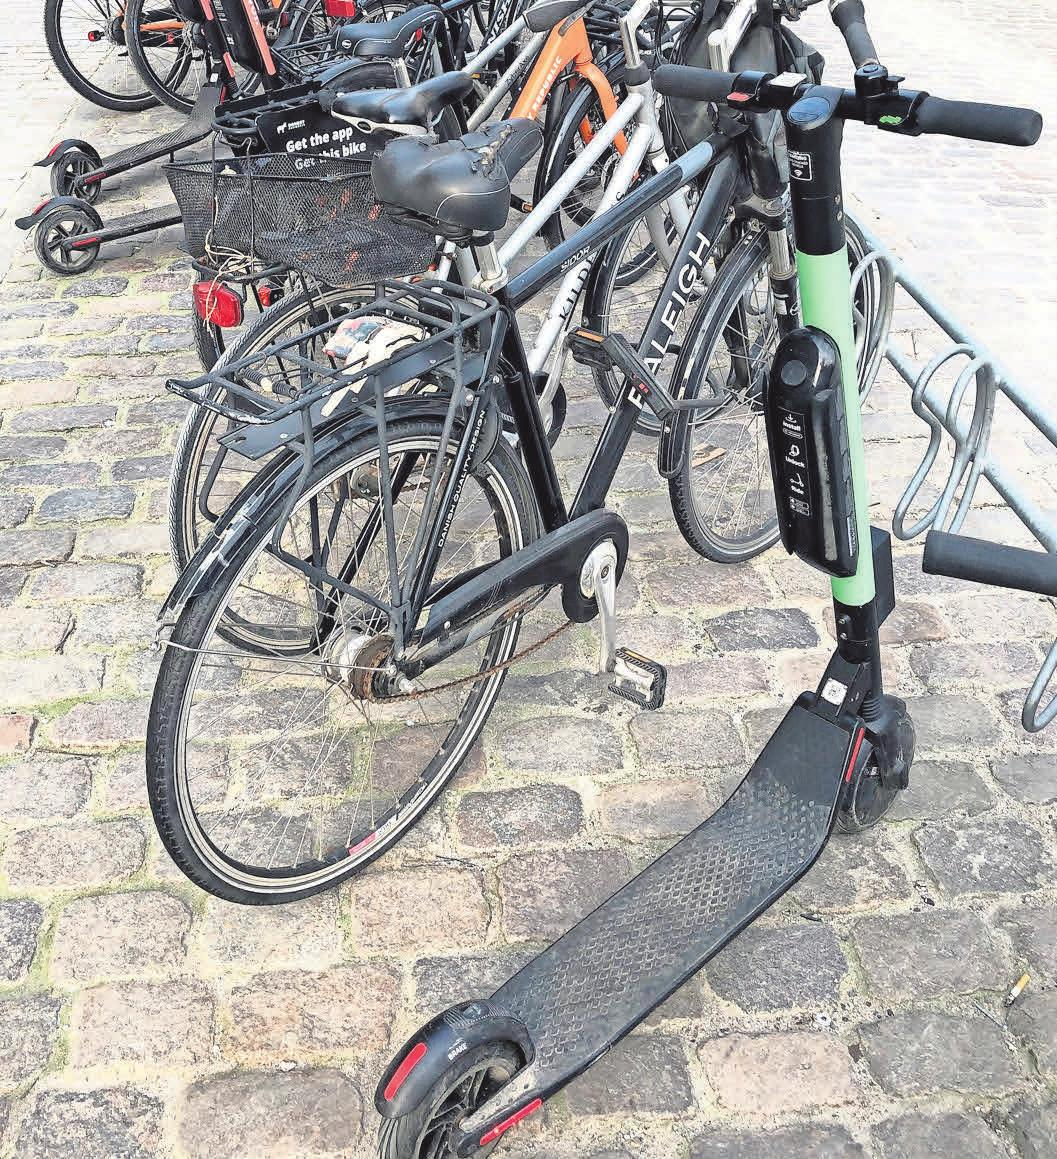 Konkurrenten: Velos und E-Scooter. FOTO: STEFFEN TRUMPF/DPA